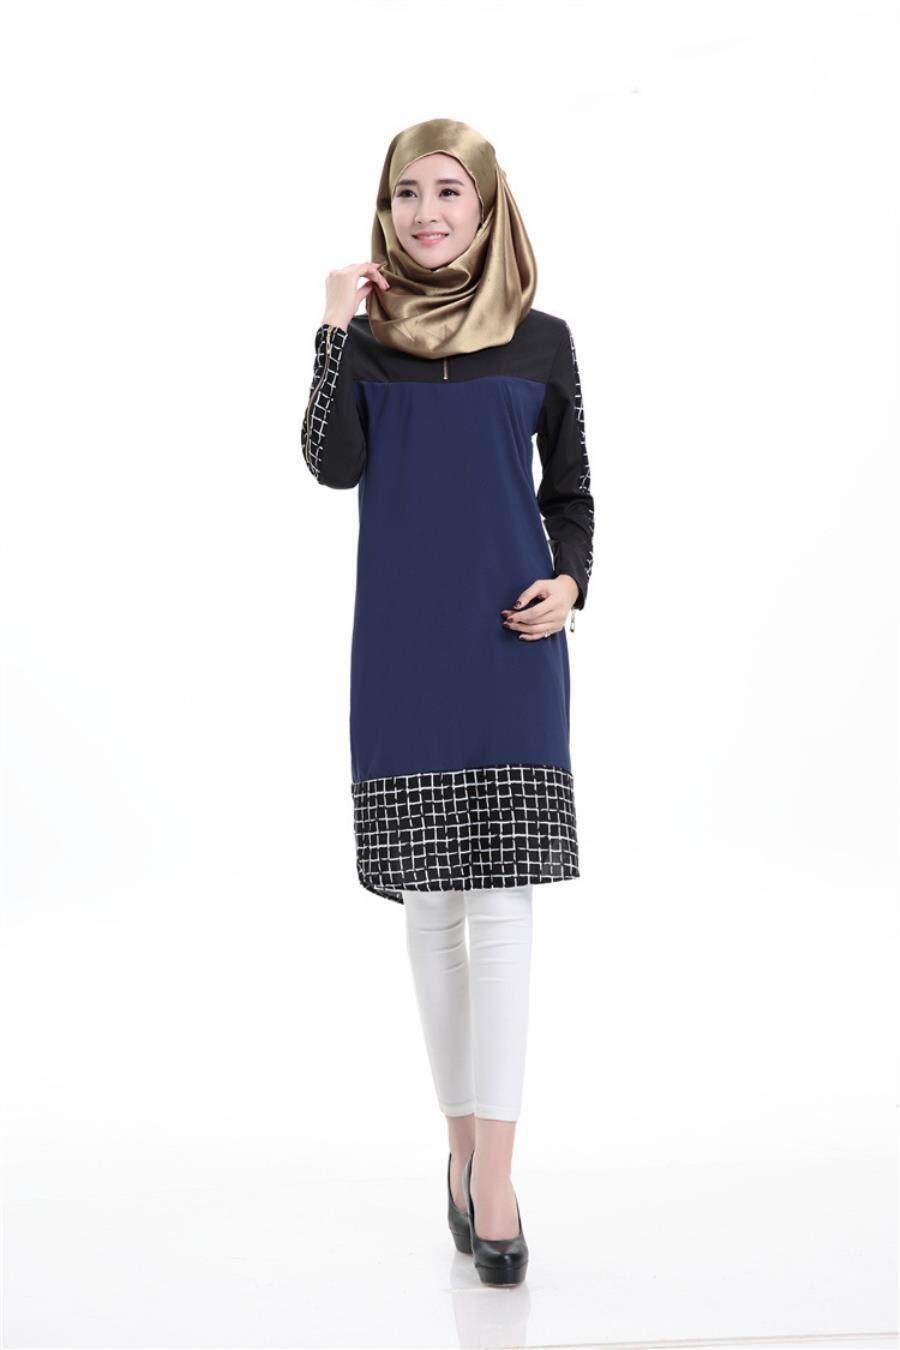 6f9f834f1 OEM New Style Two-way Spandex Muslim Plaid Panel Long Sleeve Short Dress  Saudi Arabia